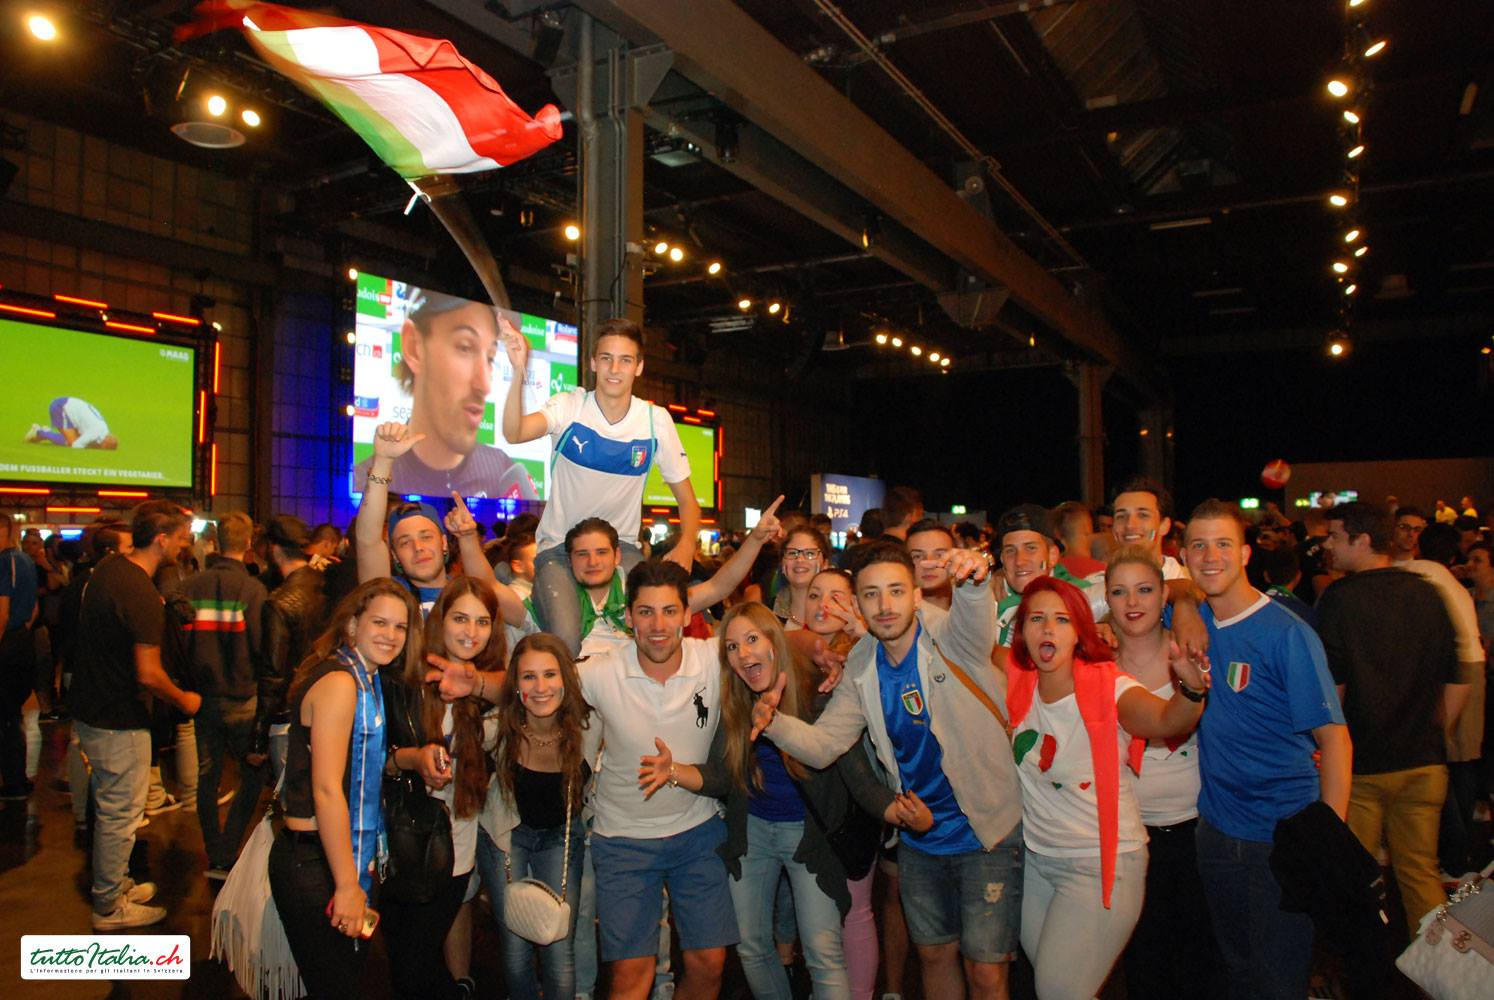 Inghilterra - Italia HiltlPublic Viewing @ Maag Halle Zurigo 2014 tuttoitalia